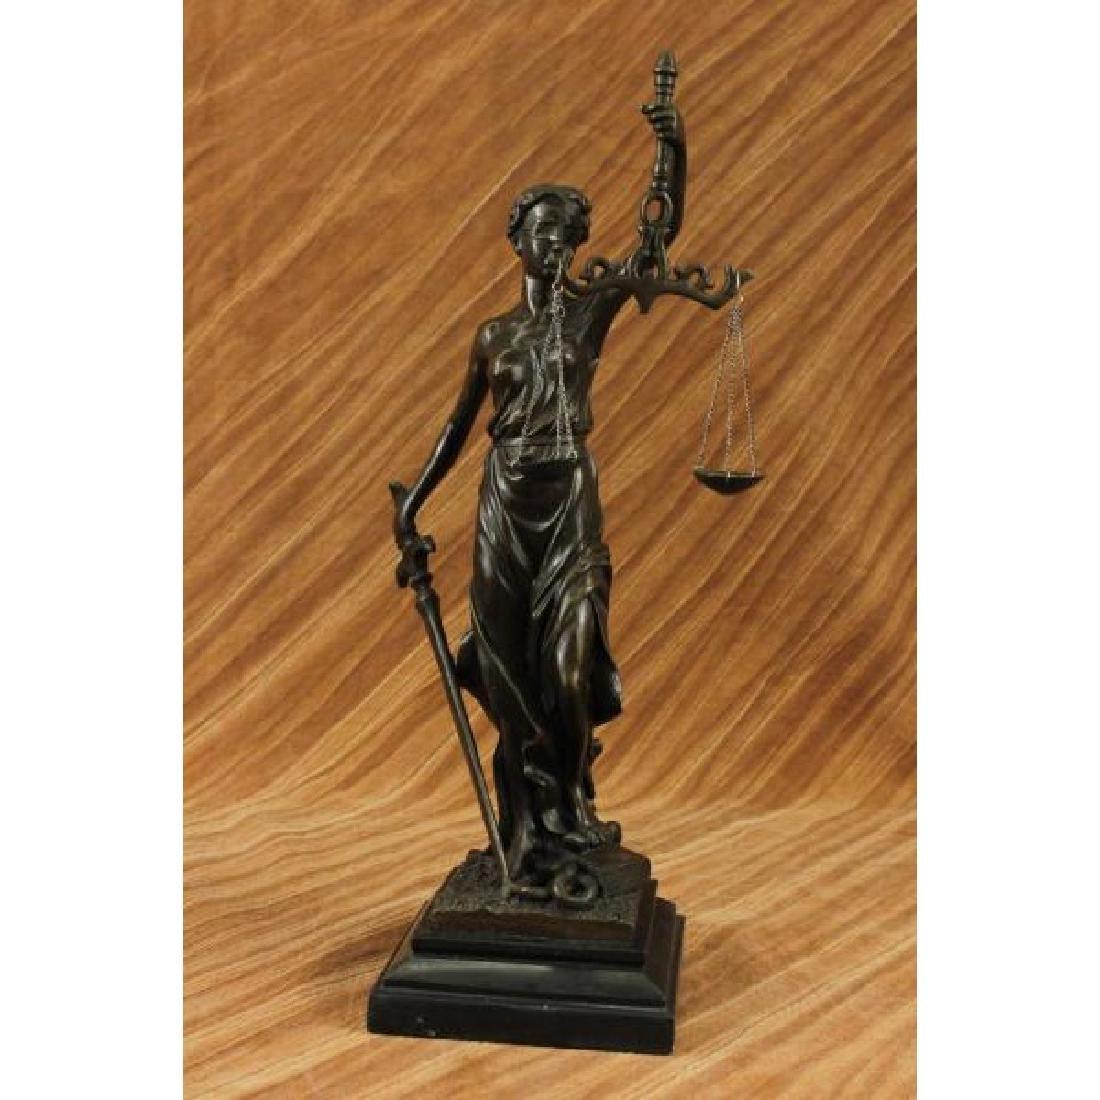 Blind Justice - Scale of Justice Bronze Sculpture